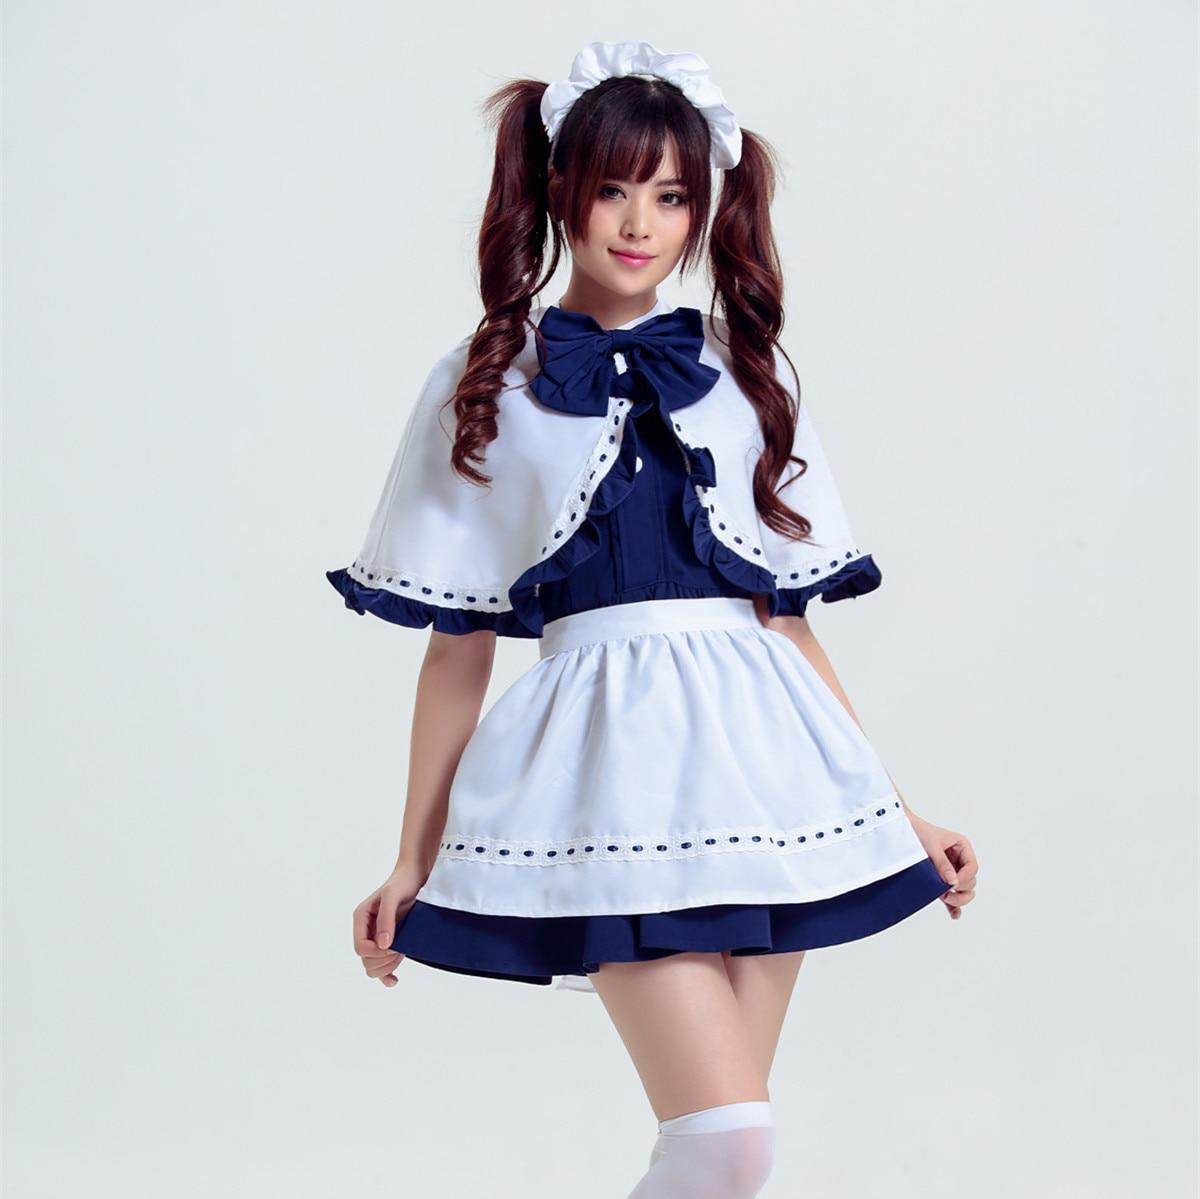 Girls School Maid Costume Cosplay Shirt+skirt Student Uniform Sailor Lolita Dress Maid Uniform Halloween